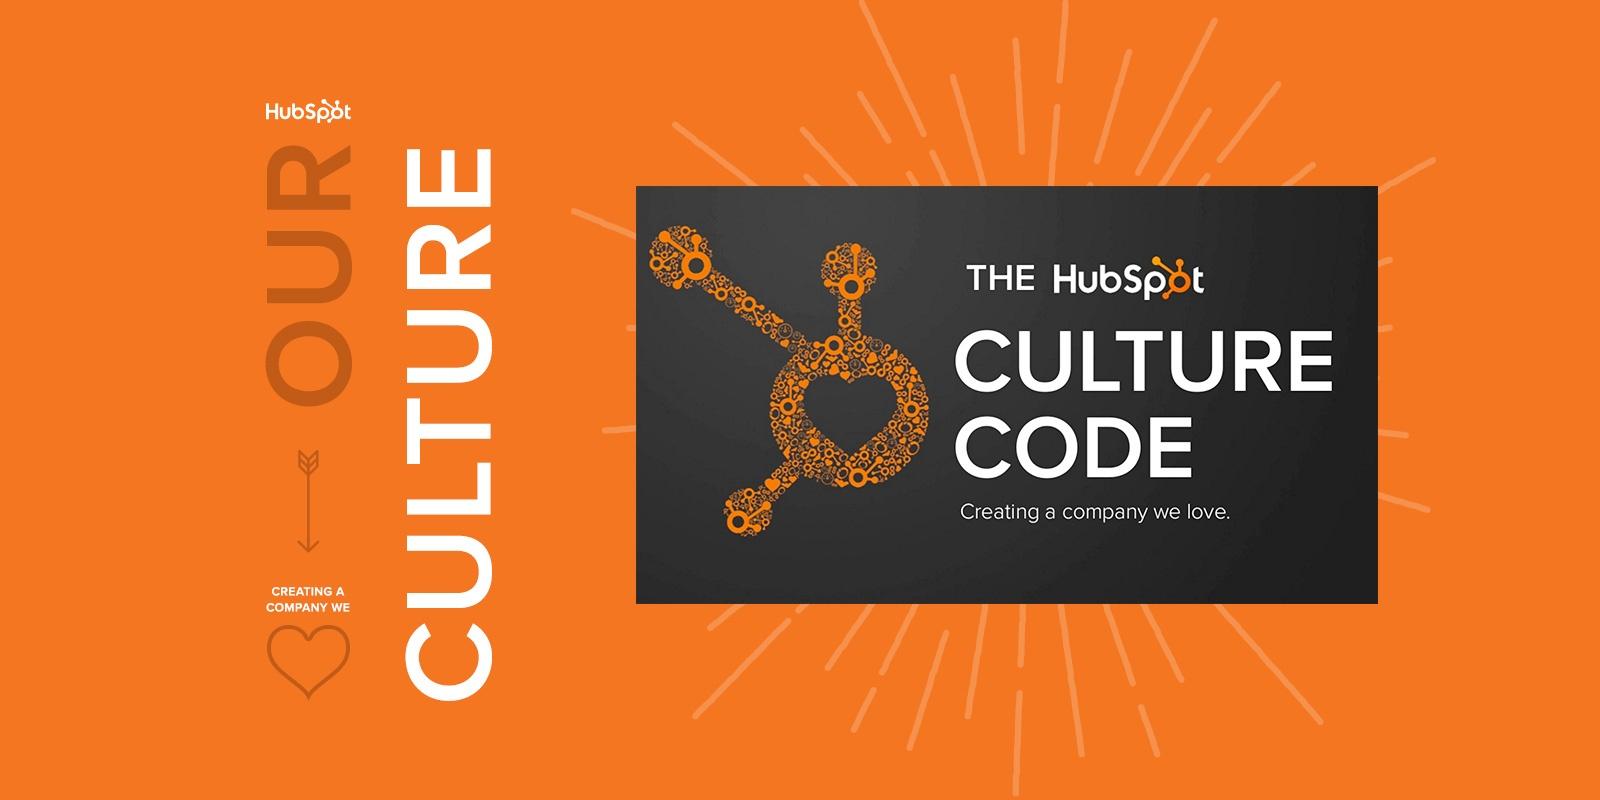 Culture_Slide_1.jpg